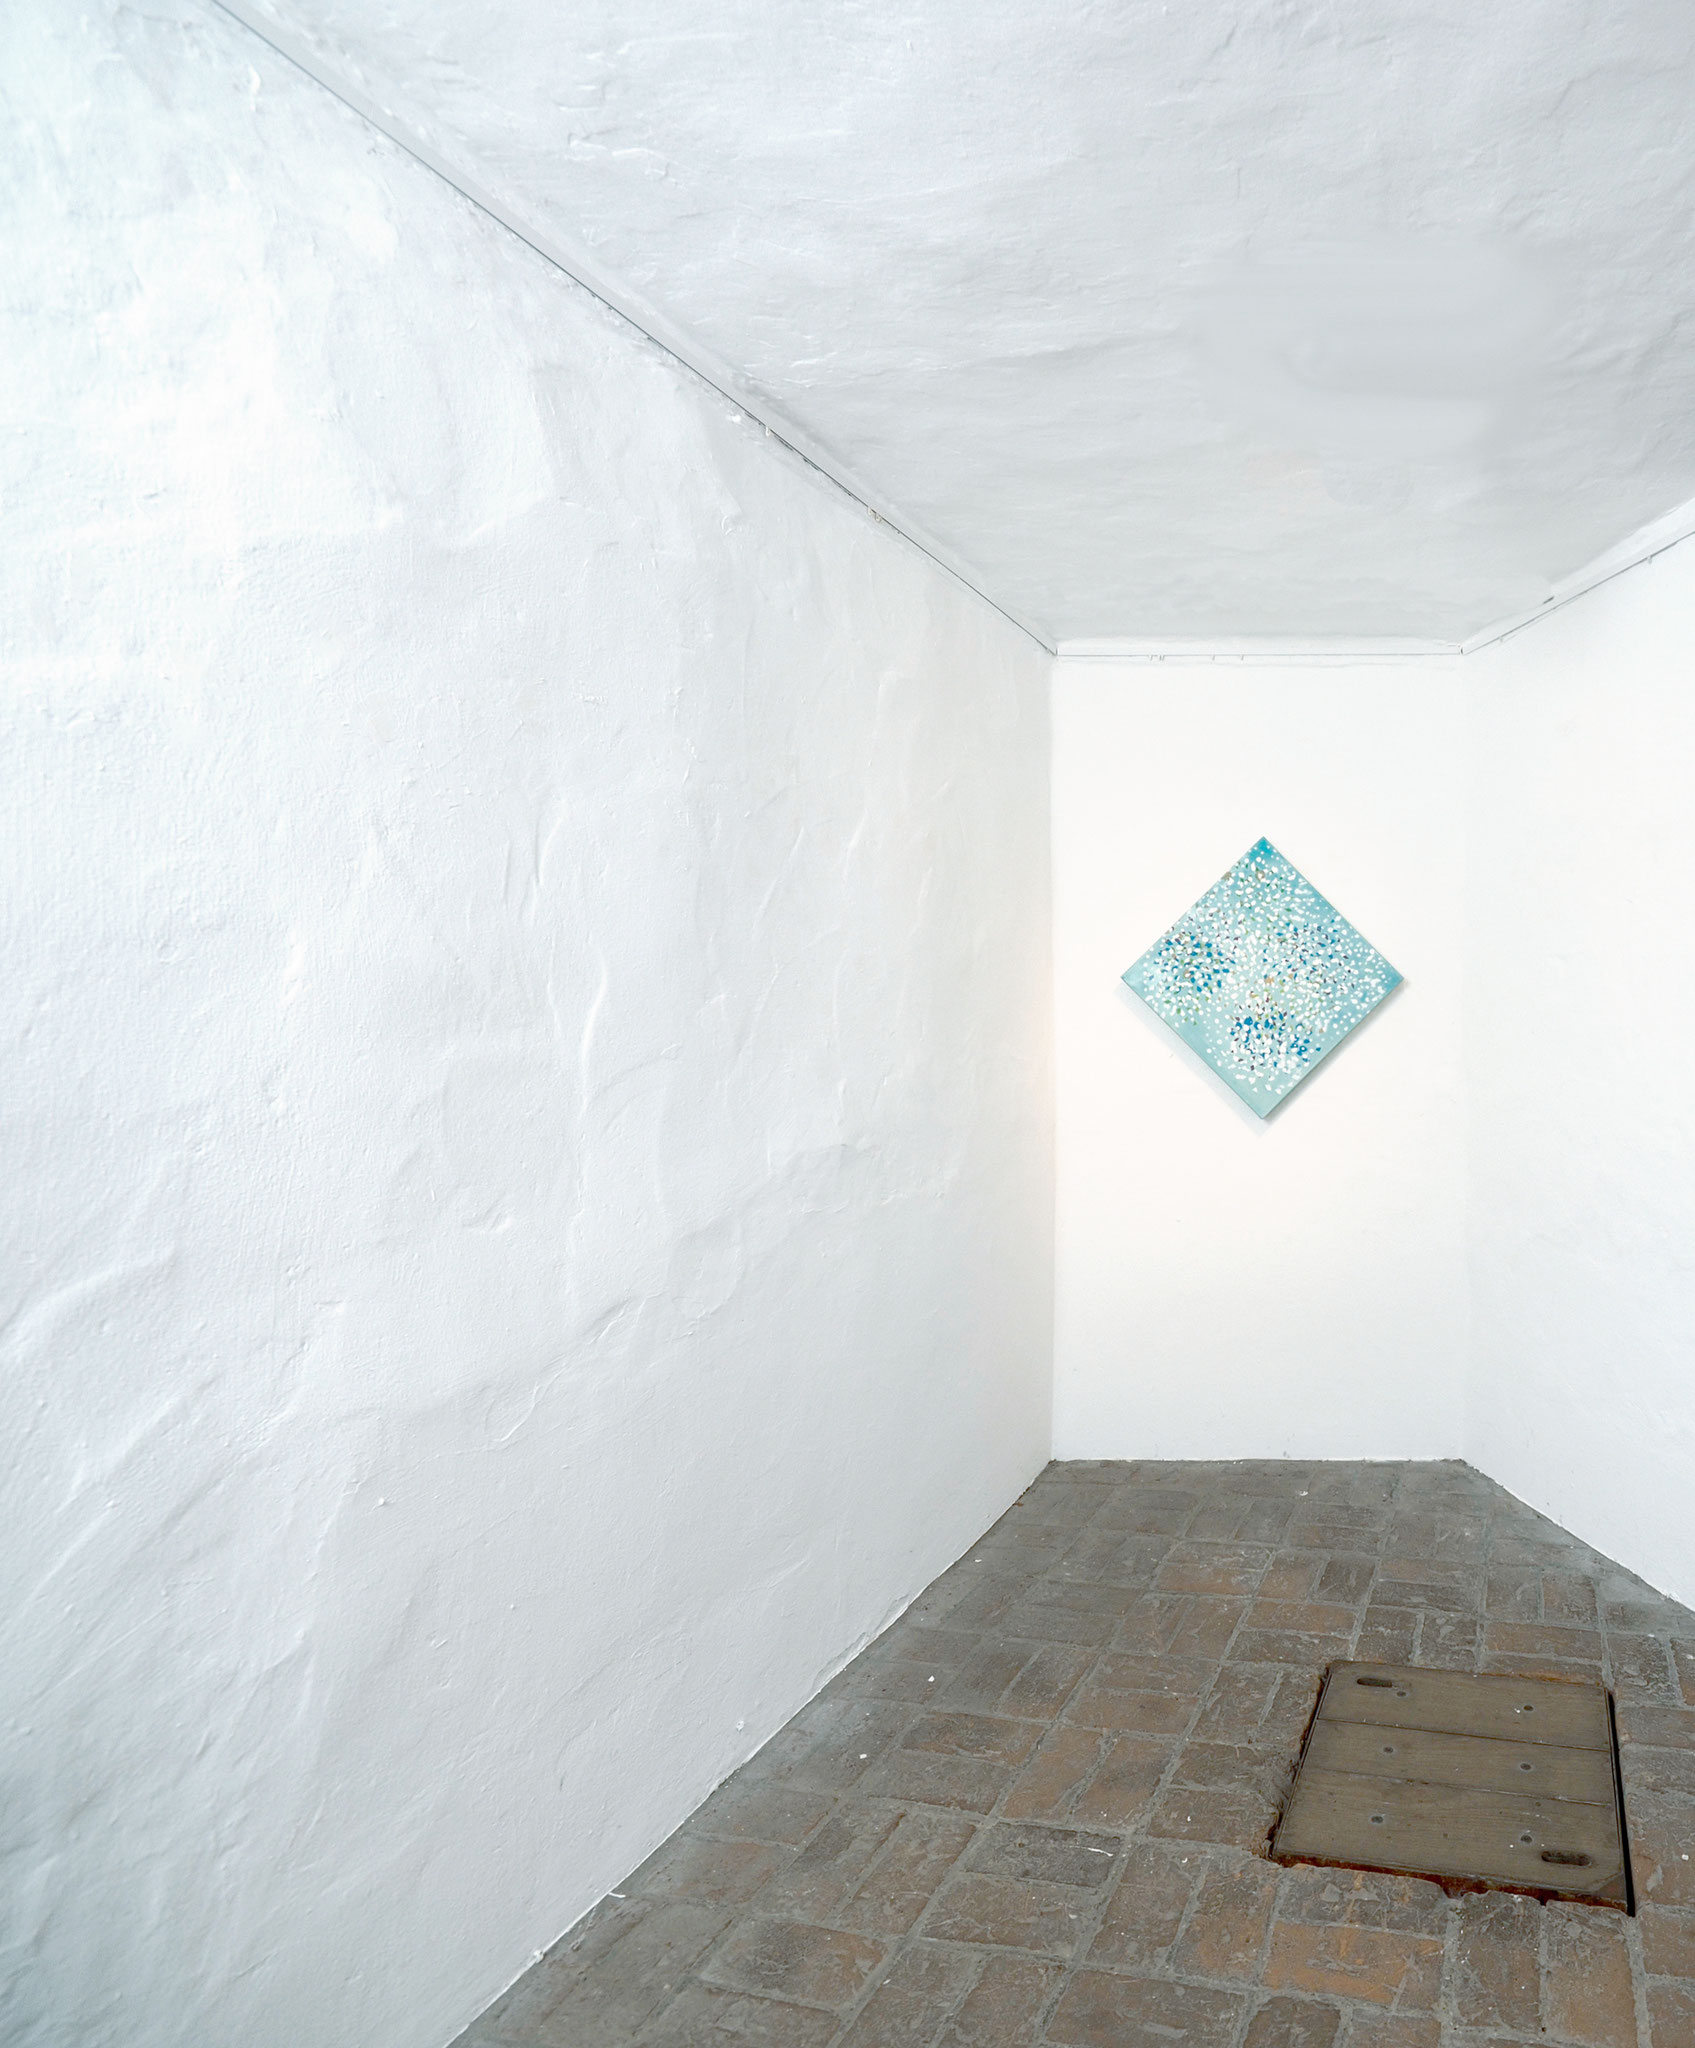 """Message Personnel (Francoise Hardy)"", 2016, 50 x 50 cm, Öl auf Leinwand Foto: Ralf Timm Ausstellung ""Lost Places"", Kunstverein Kaponier Vechta, 2016"